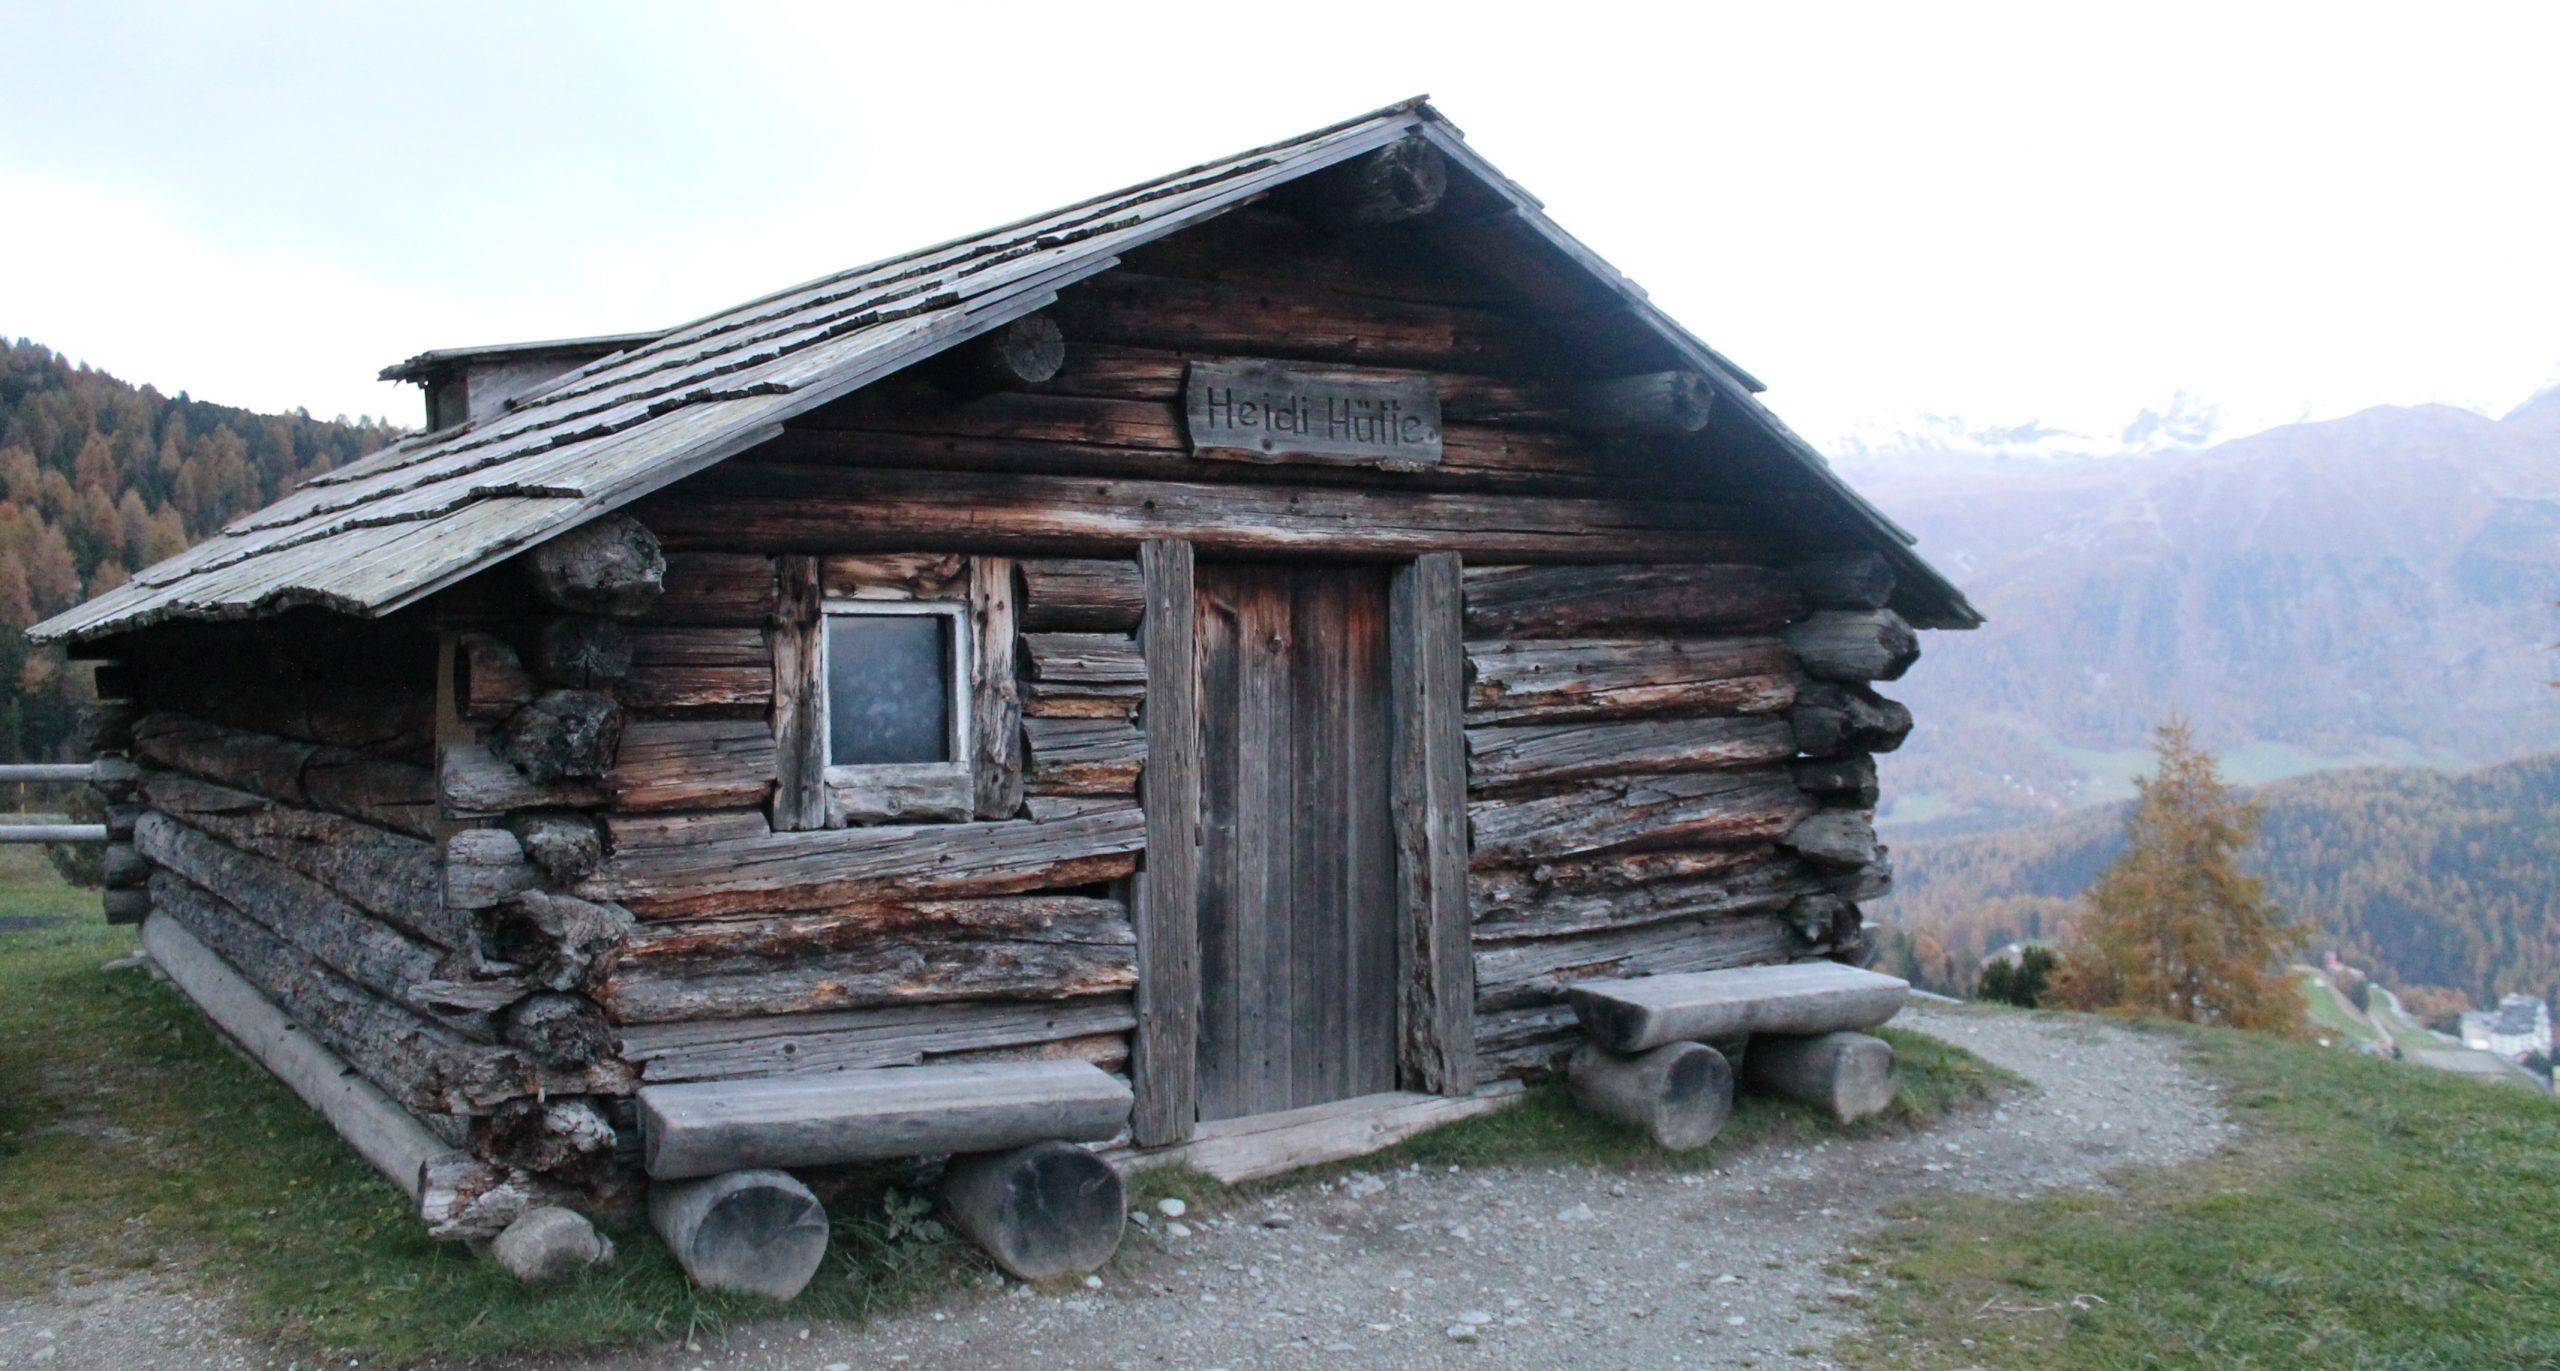 Diavolezza, Morteratsch Glacier and Heidi's Hut – St Moritz, Switzerland